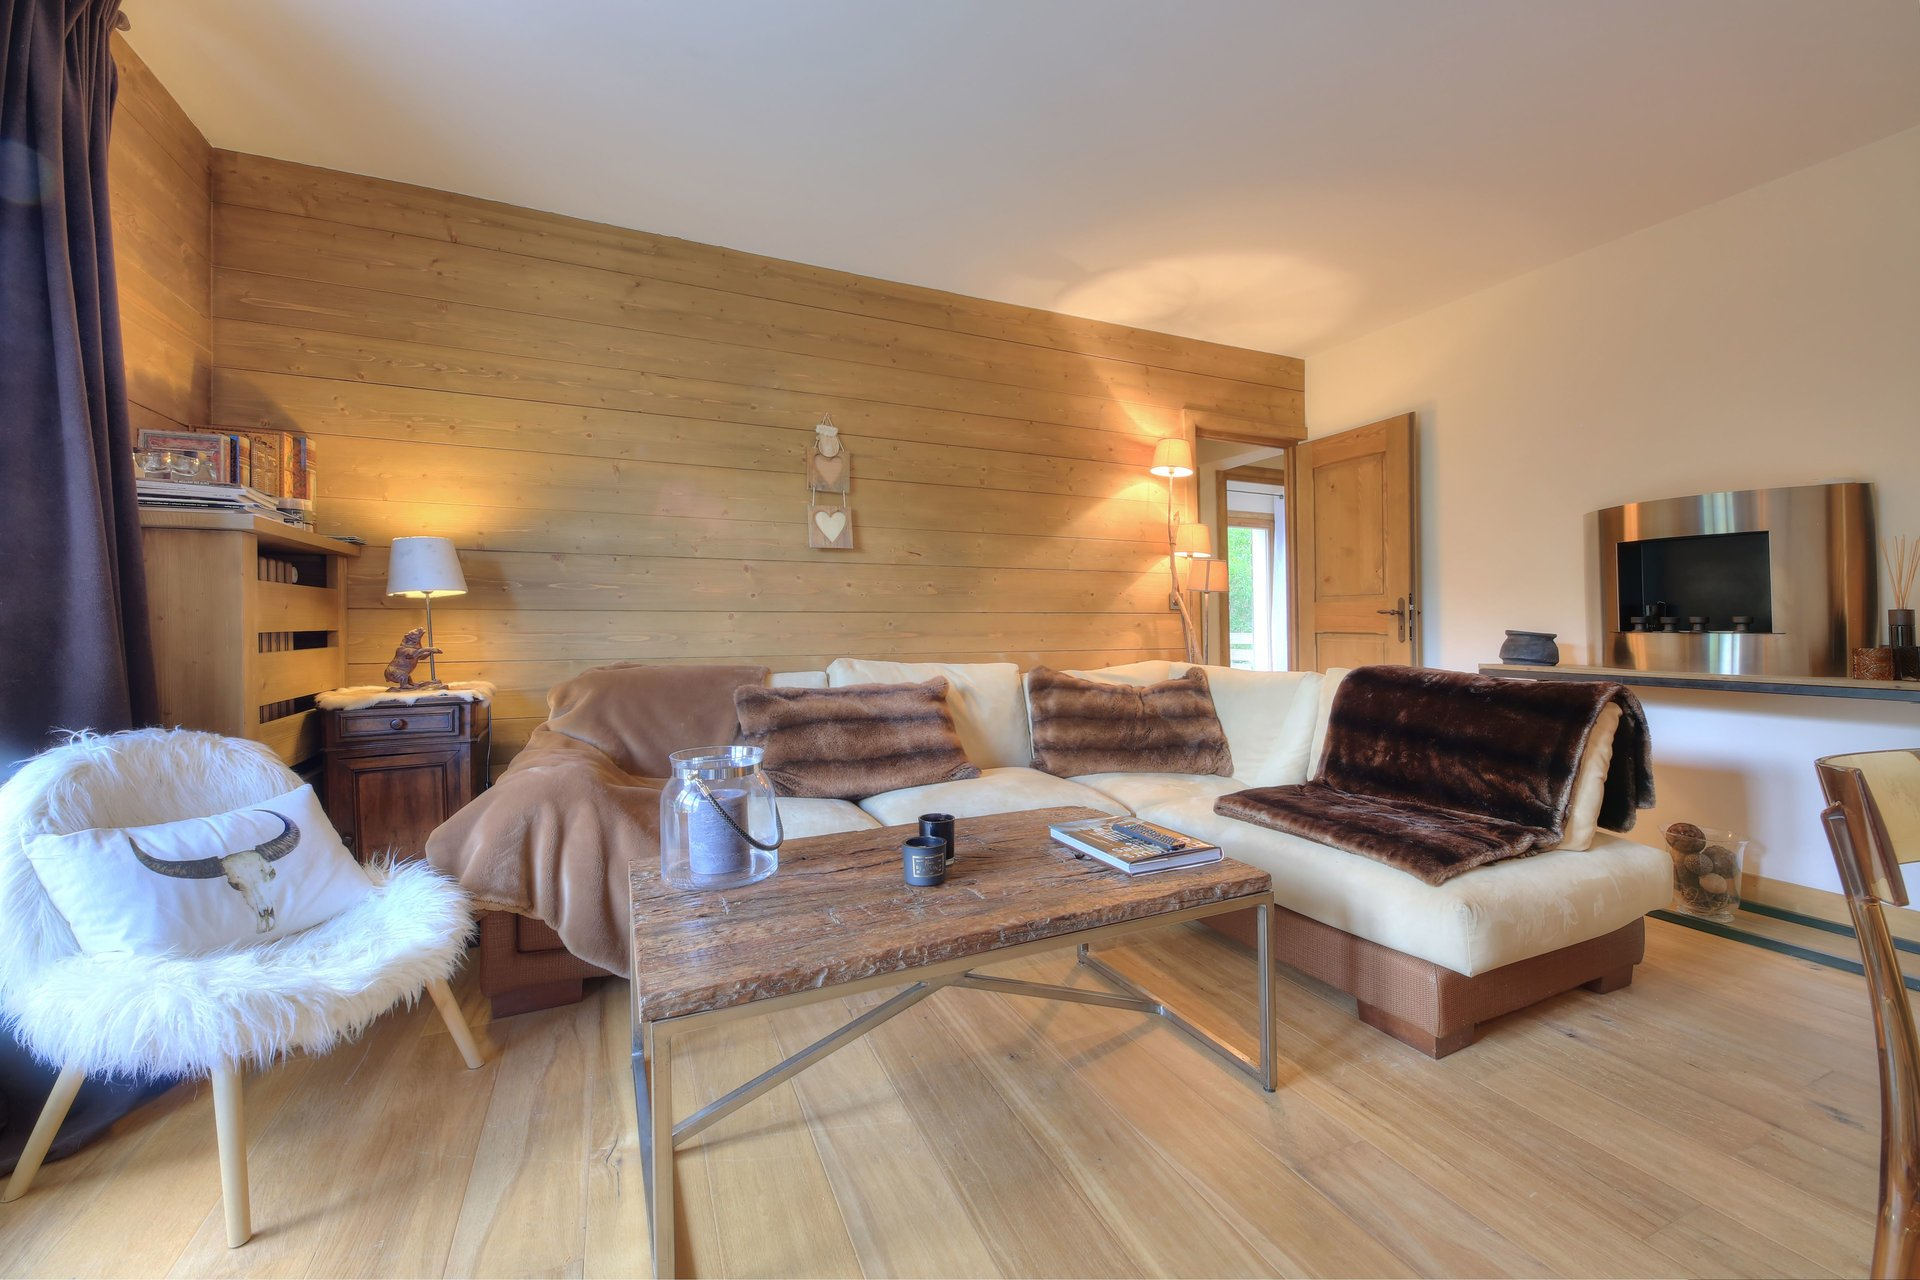 Apartment in Megève, Auvergne-Rhône-Alpes, France 1